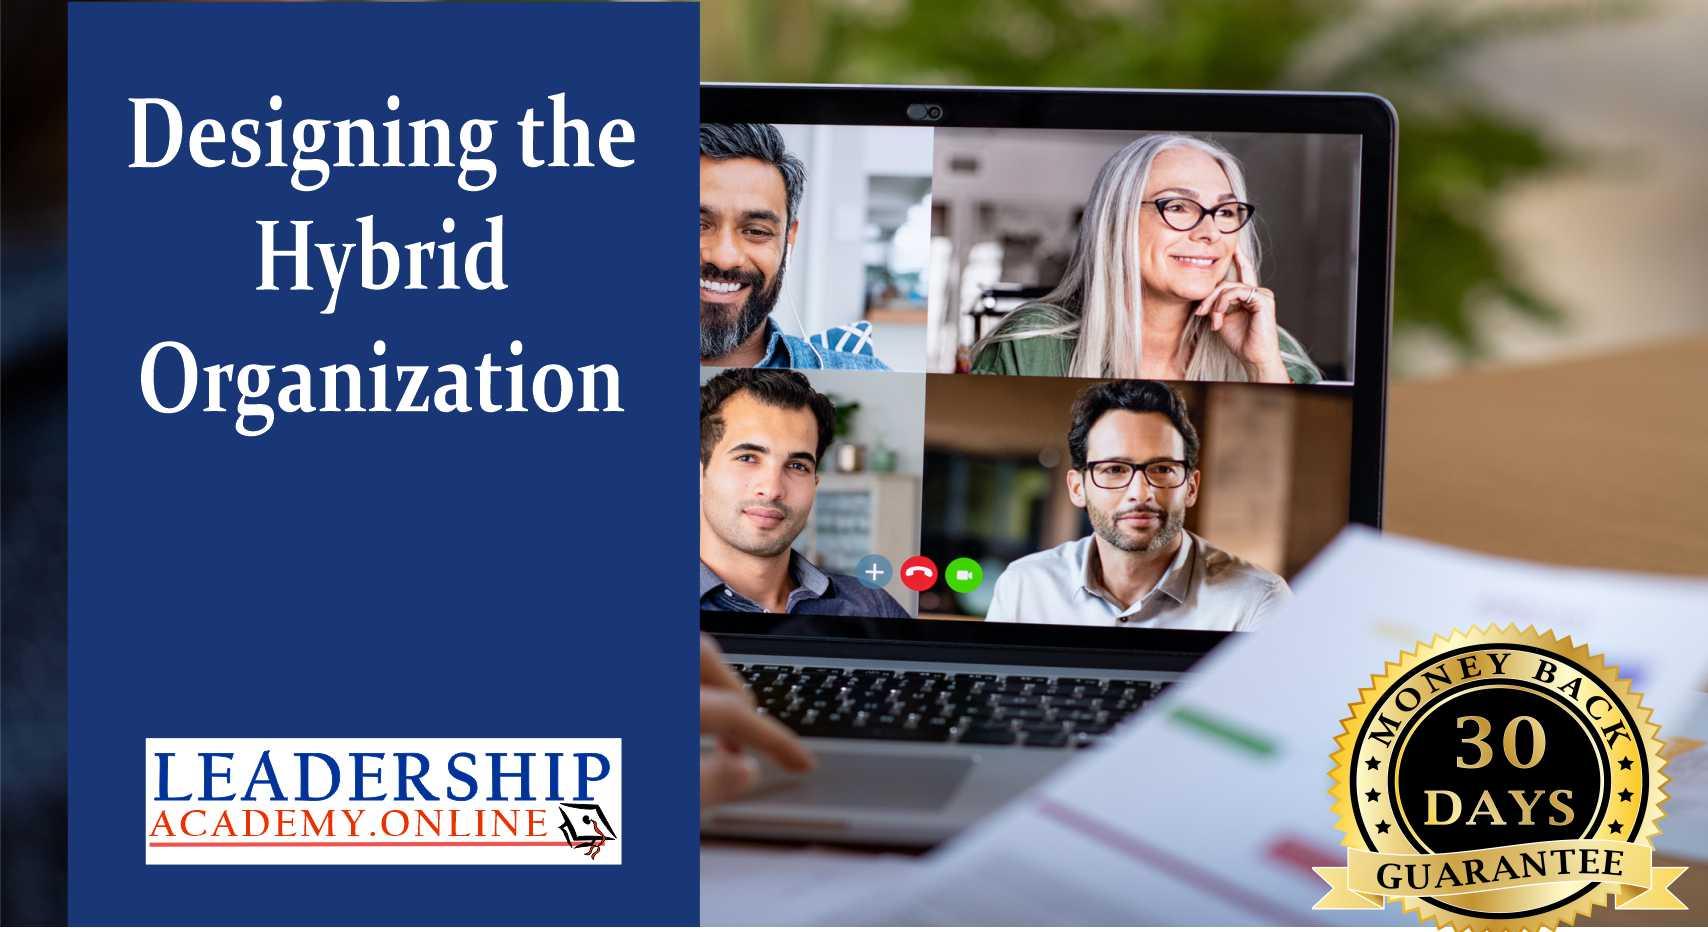 Designing the Hybrid Organization